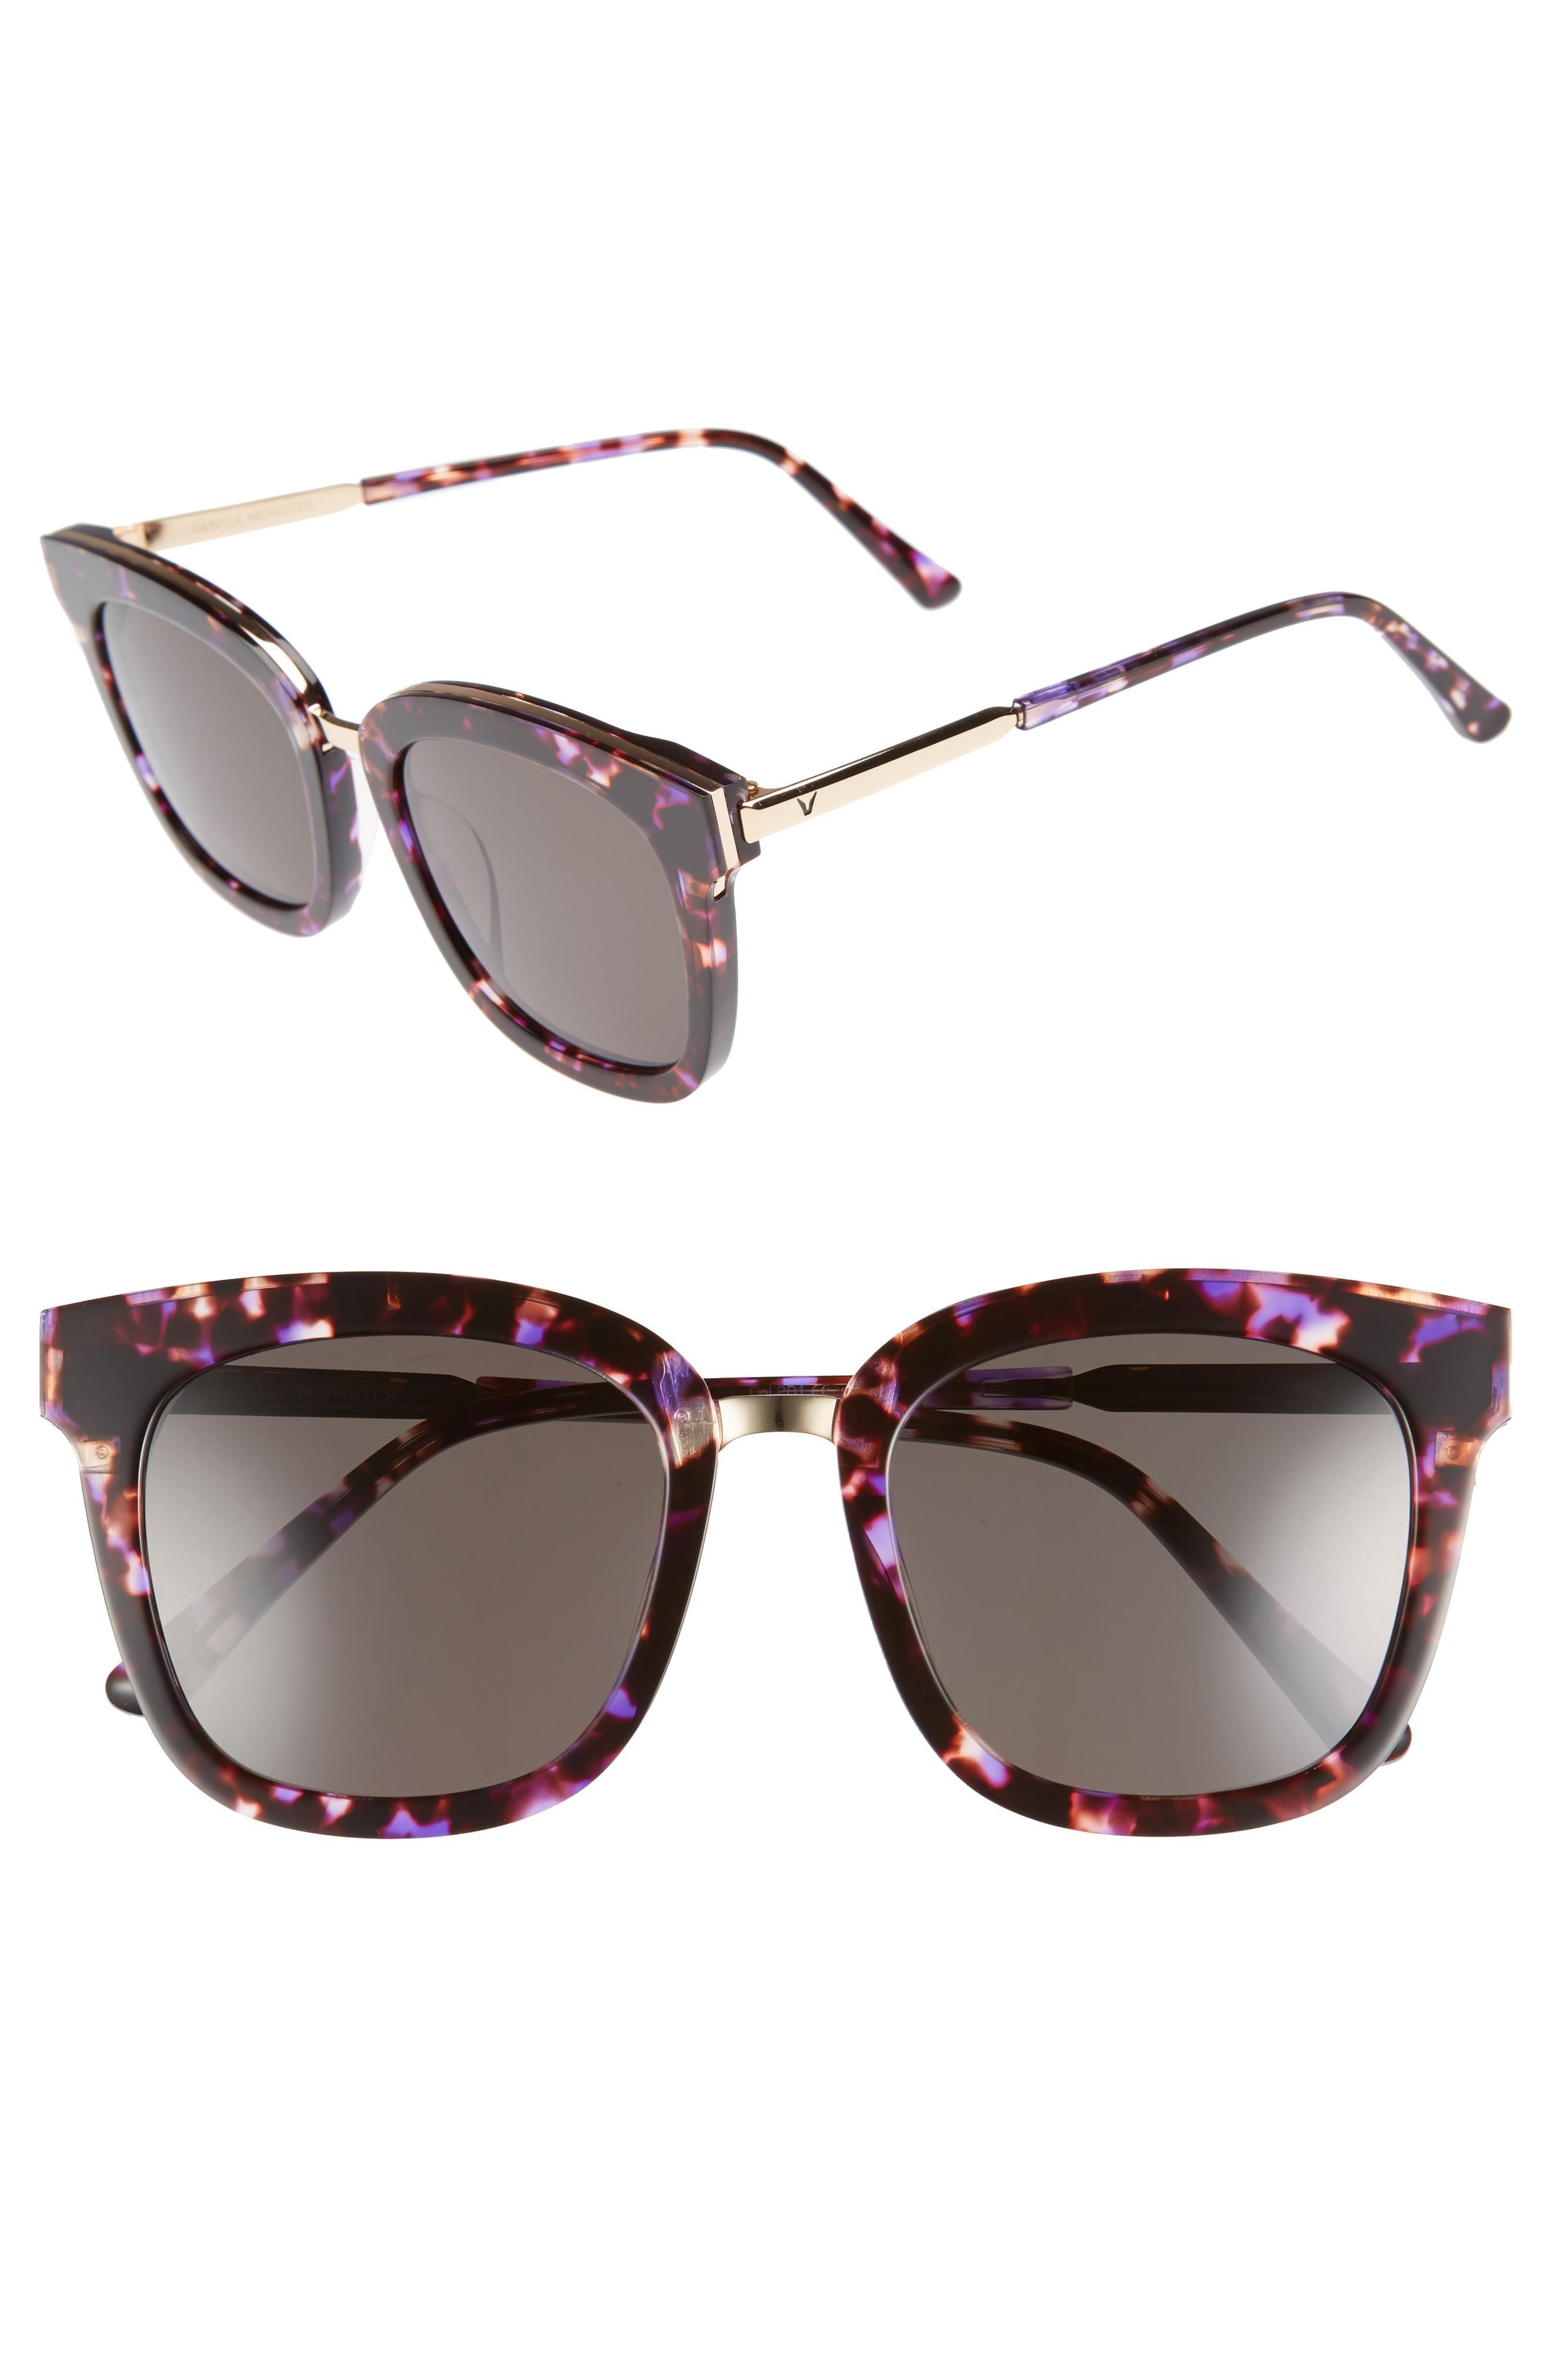 3a49fe0f8212b Gentle Monster Button 54Mm Zeiss Lens Sunglasses - Purple  Gold ...